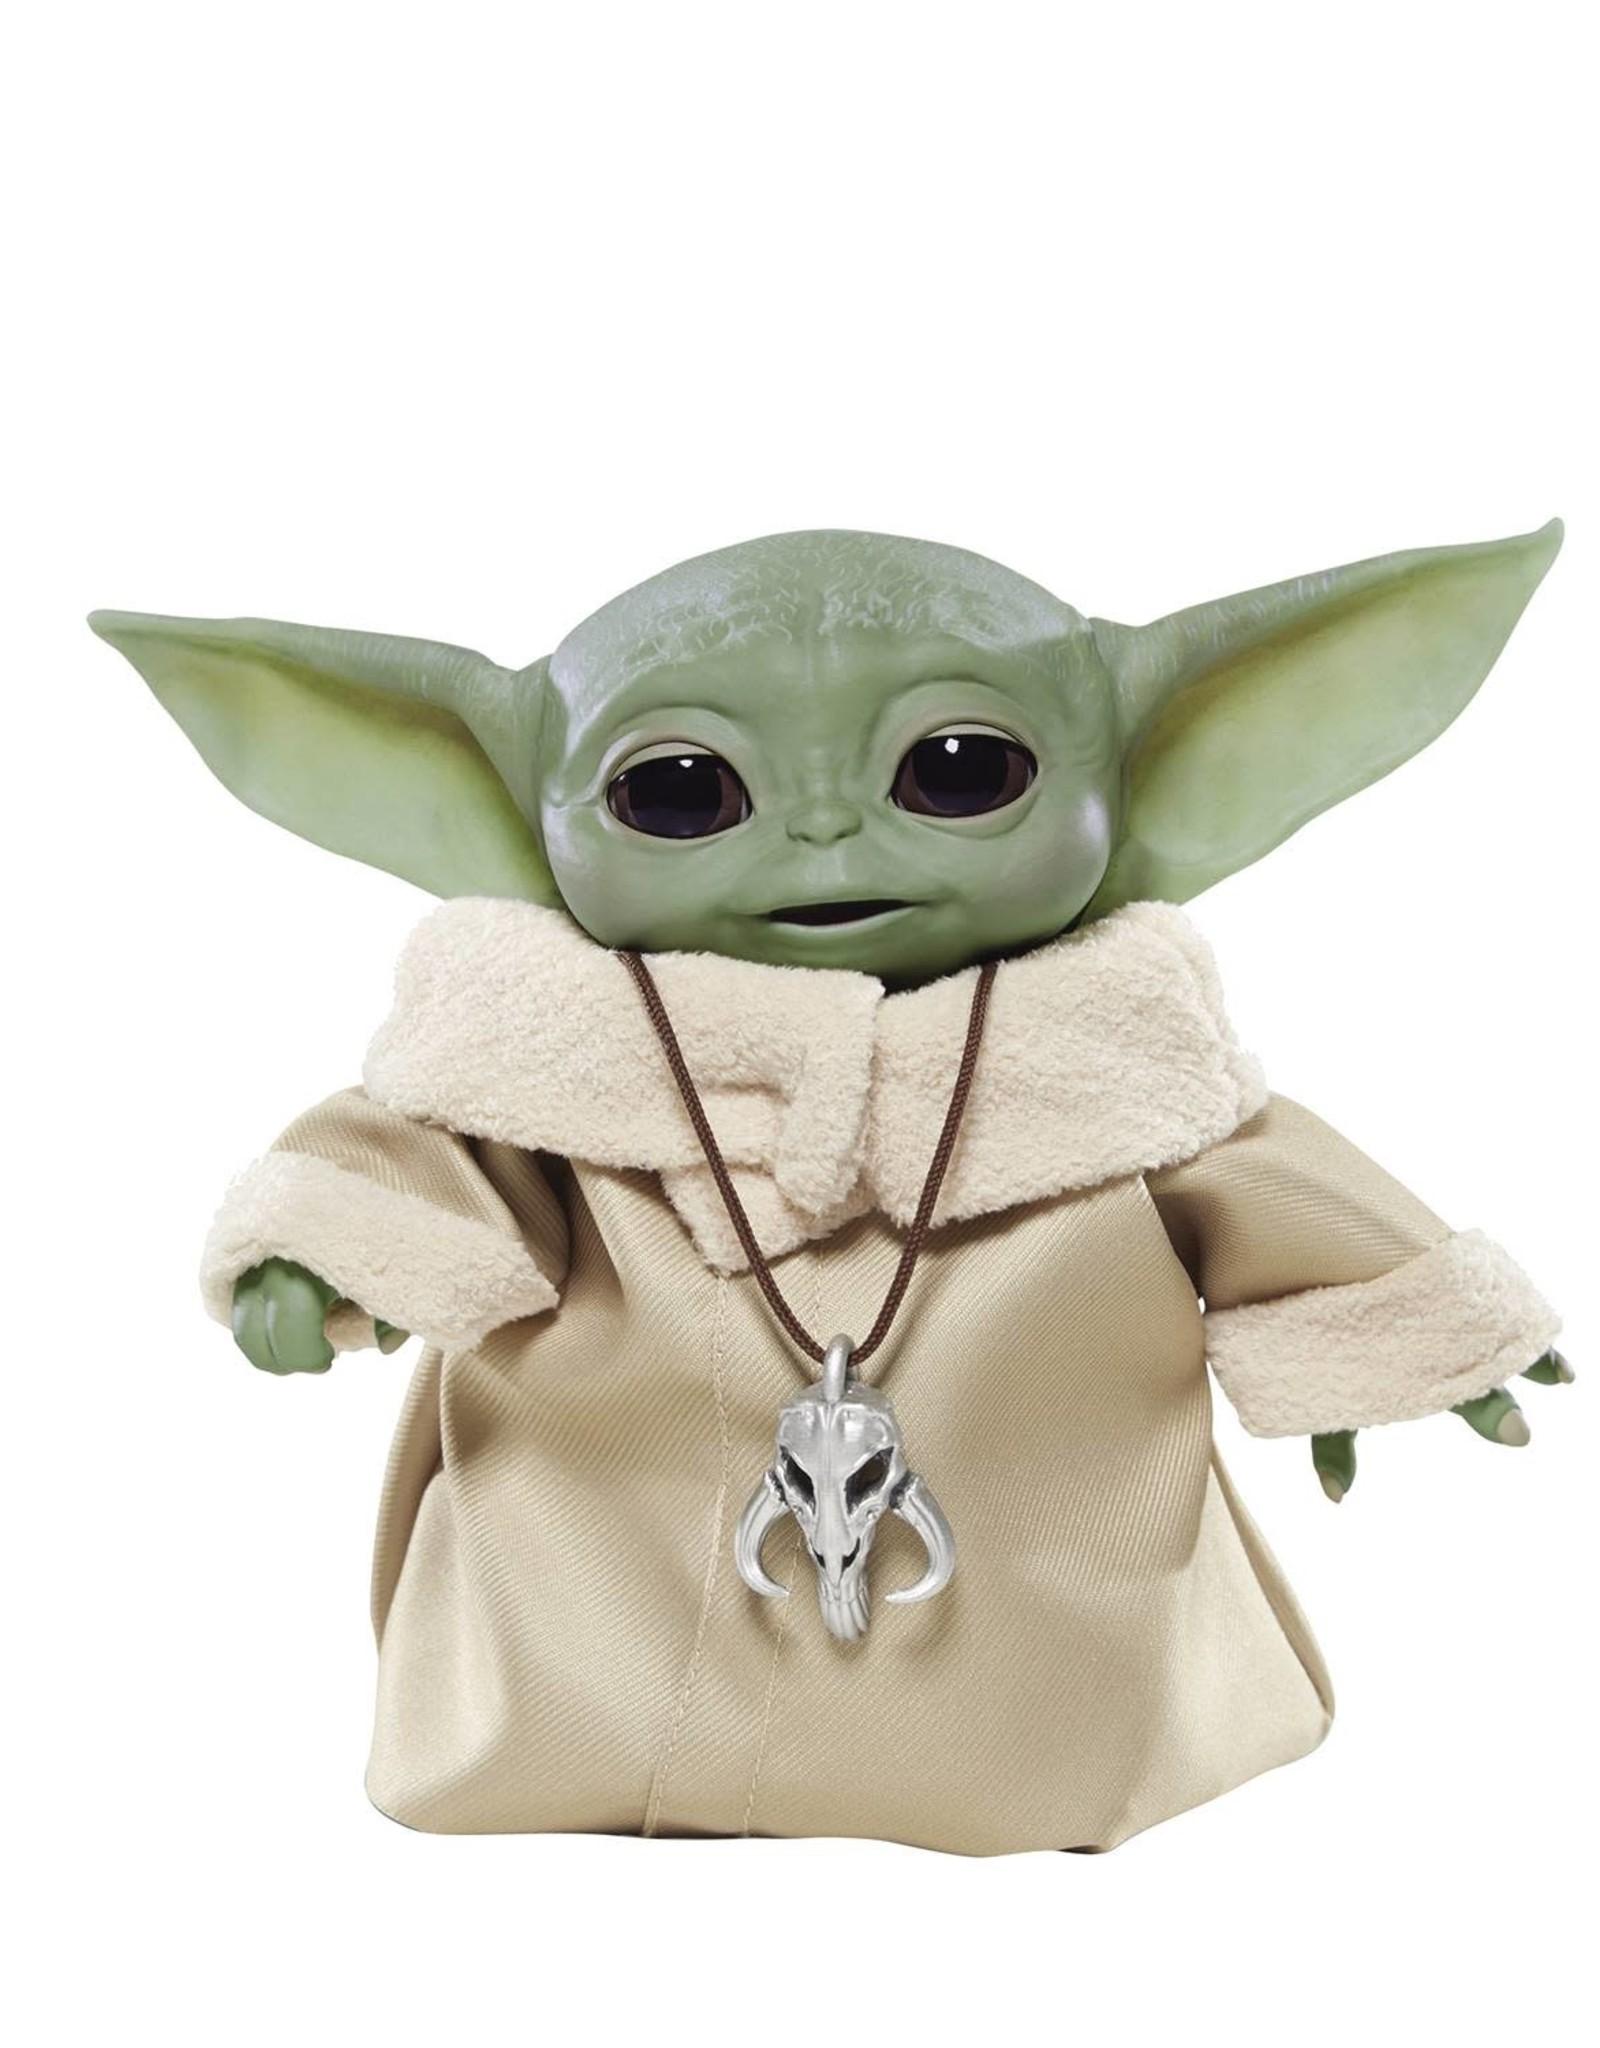 Hasbro Star Wars The Mandalorian The Child Animatronic Figure